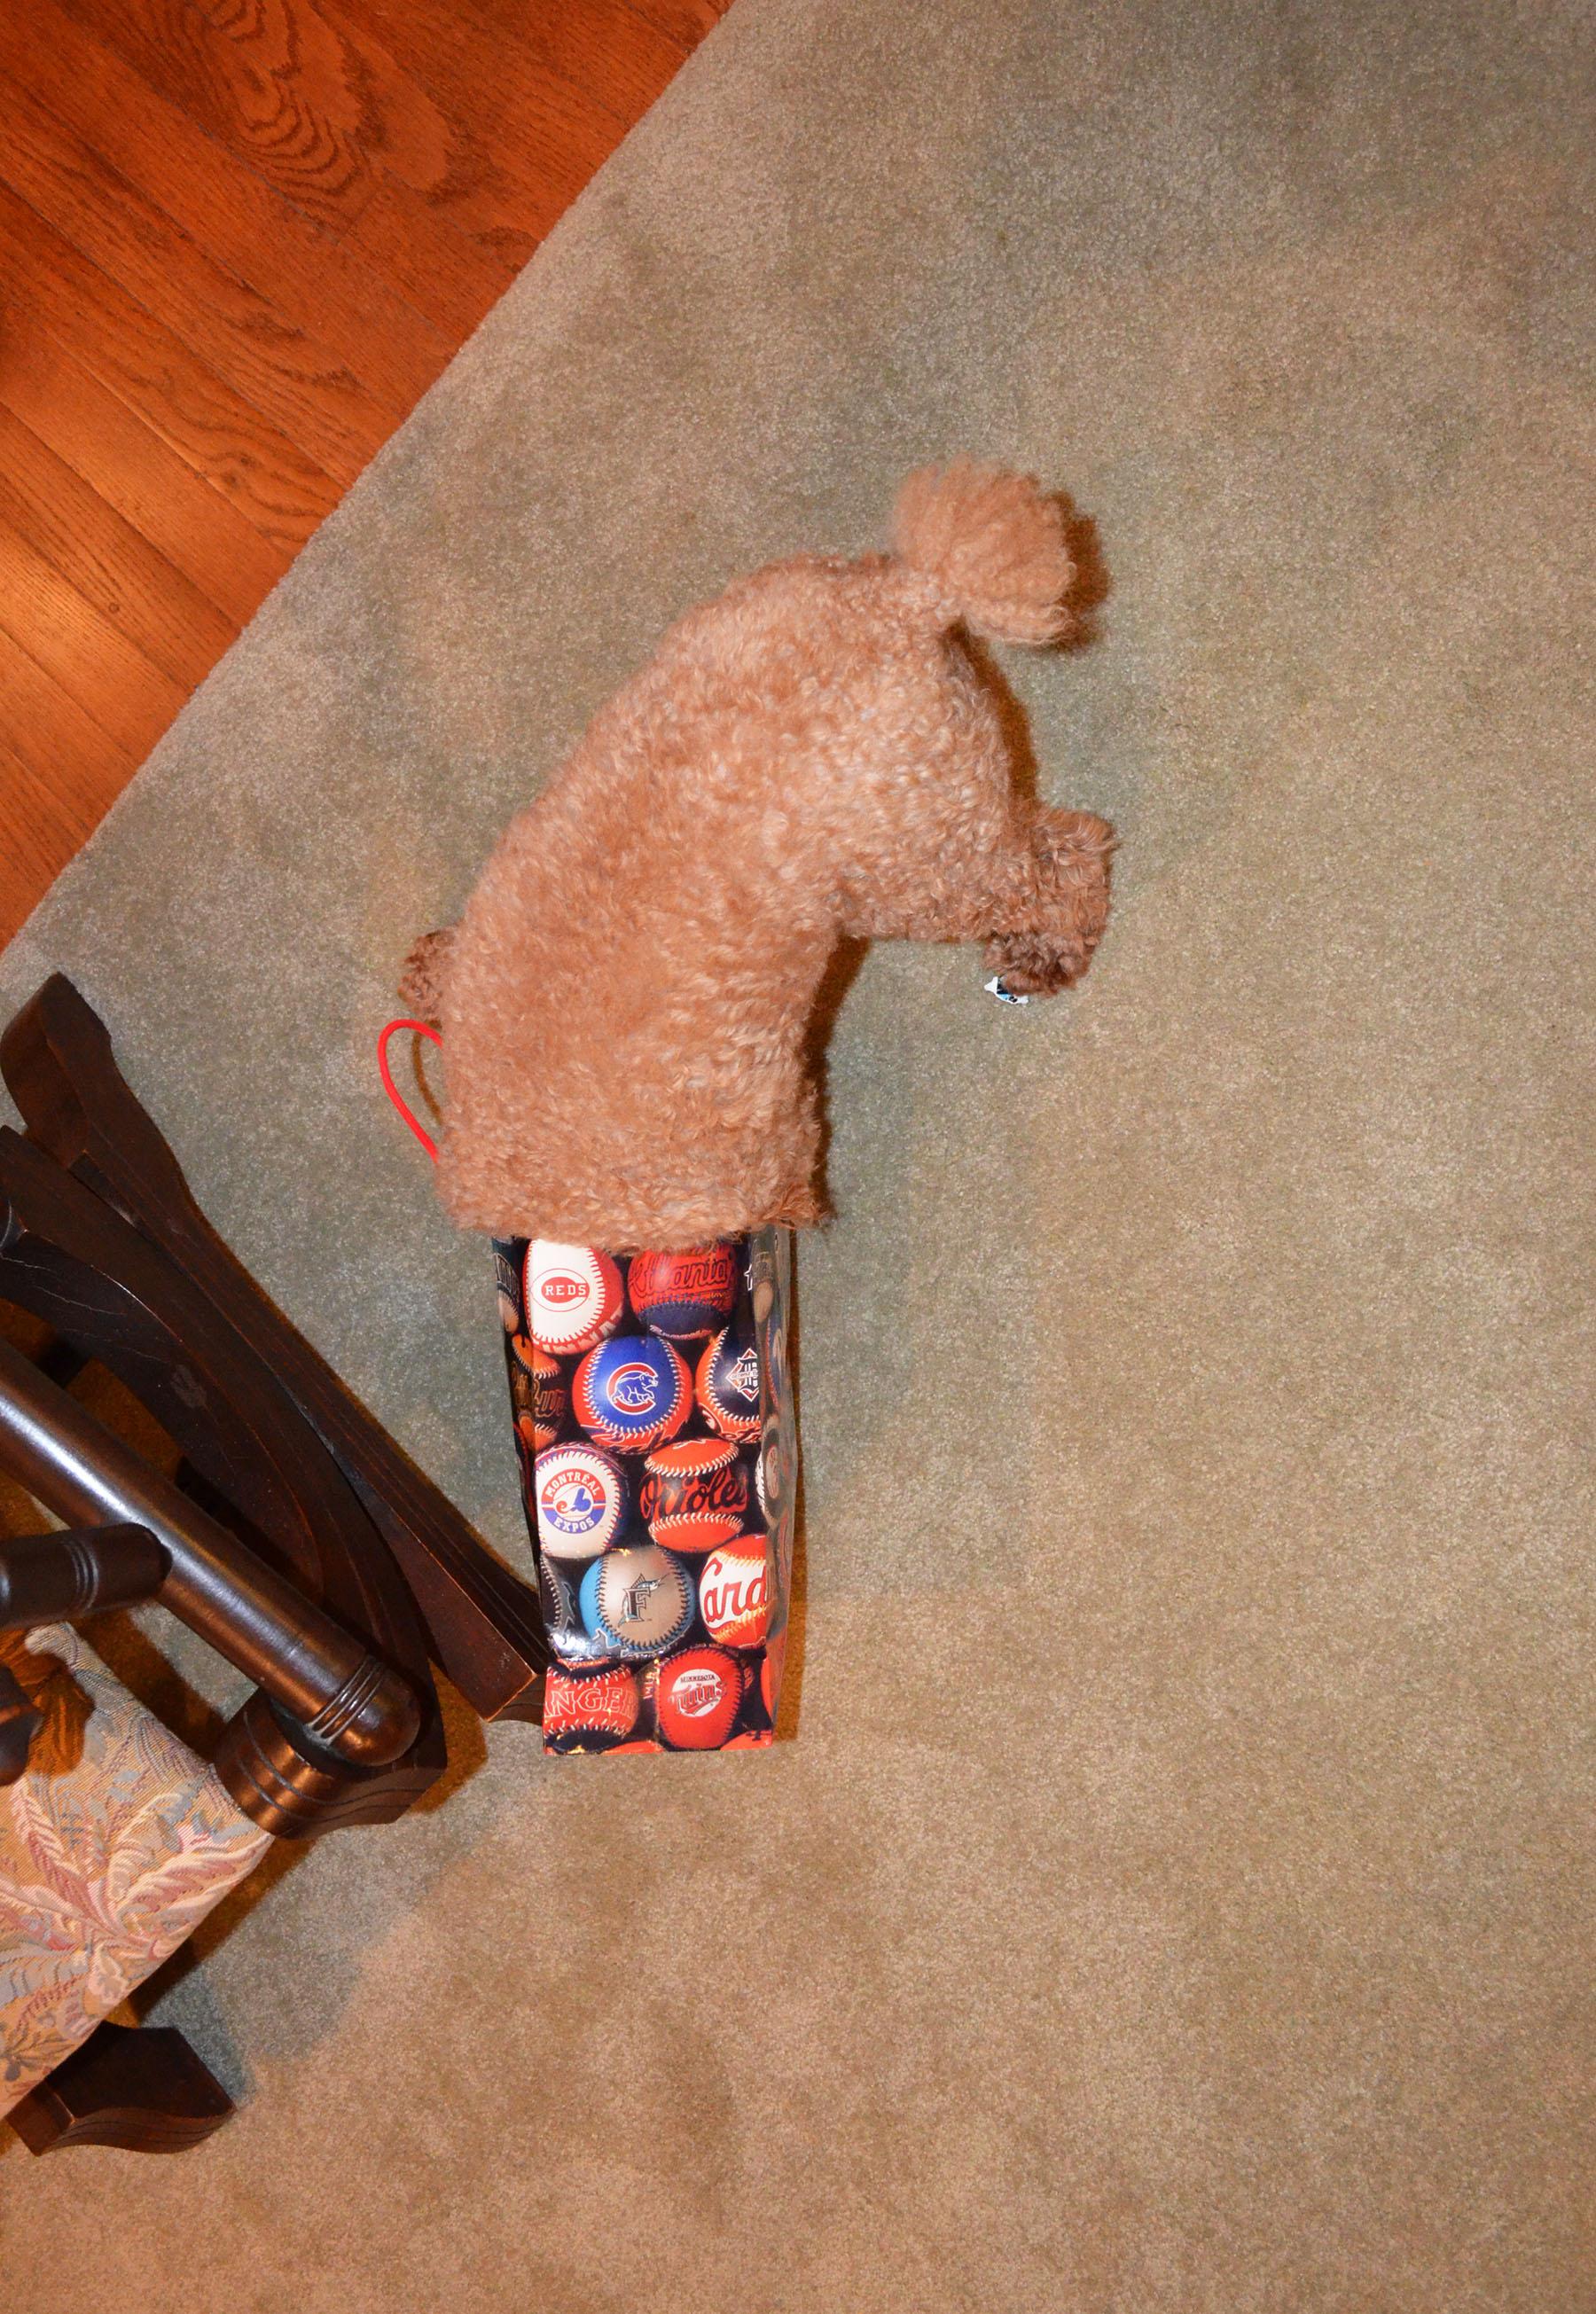 Silly Dog!